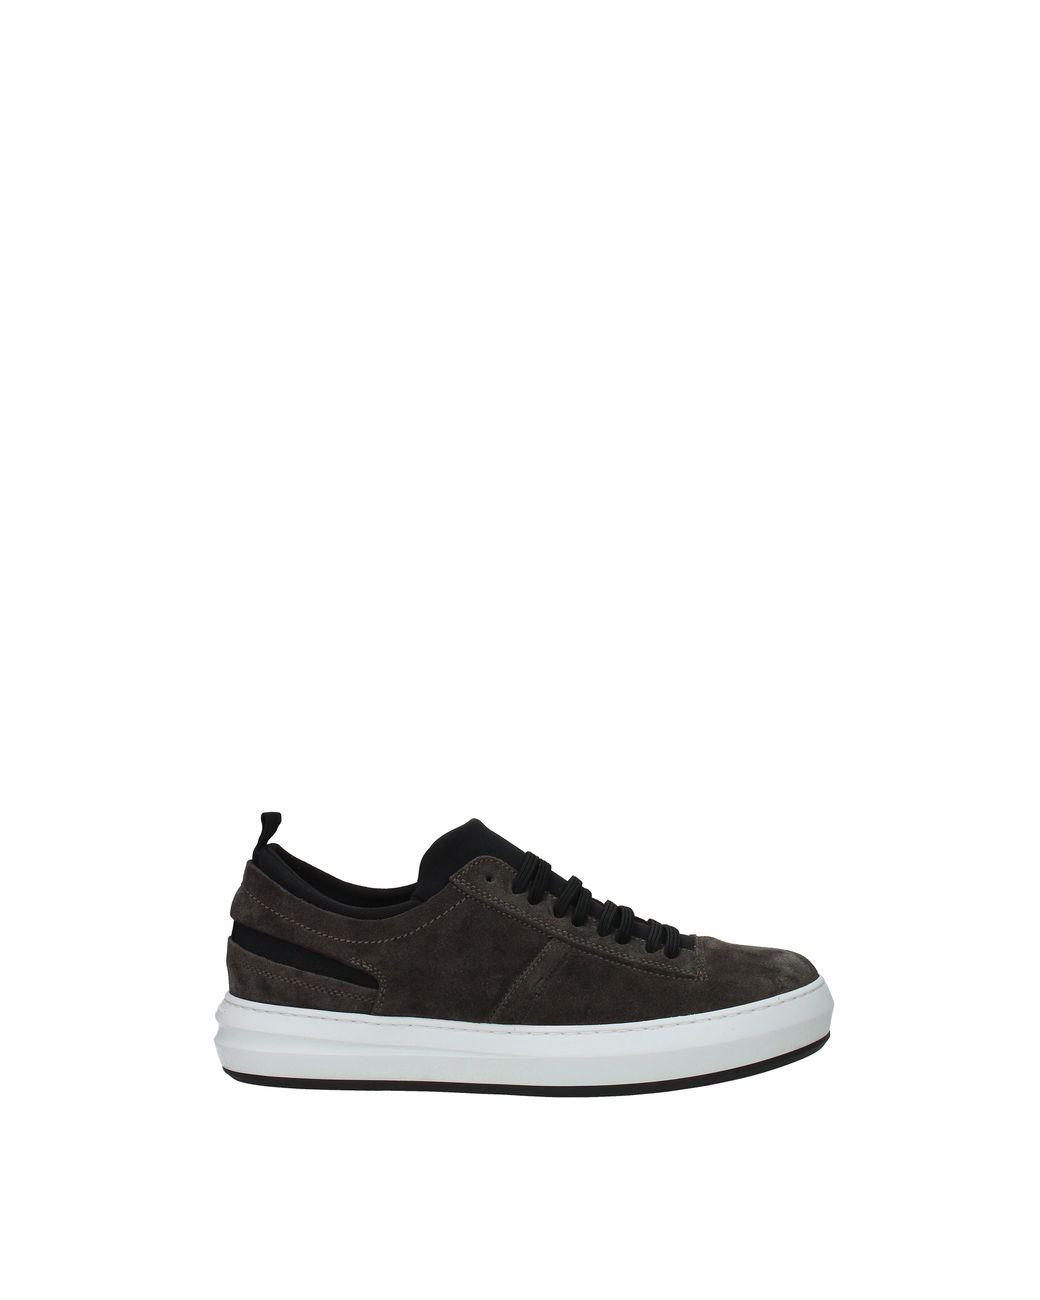 179d355ca Lyst - Ferragamo Sneakers Desert Men Gray in Black for Men